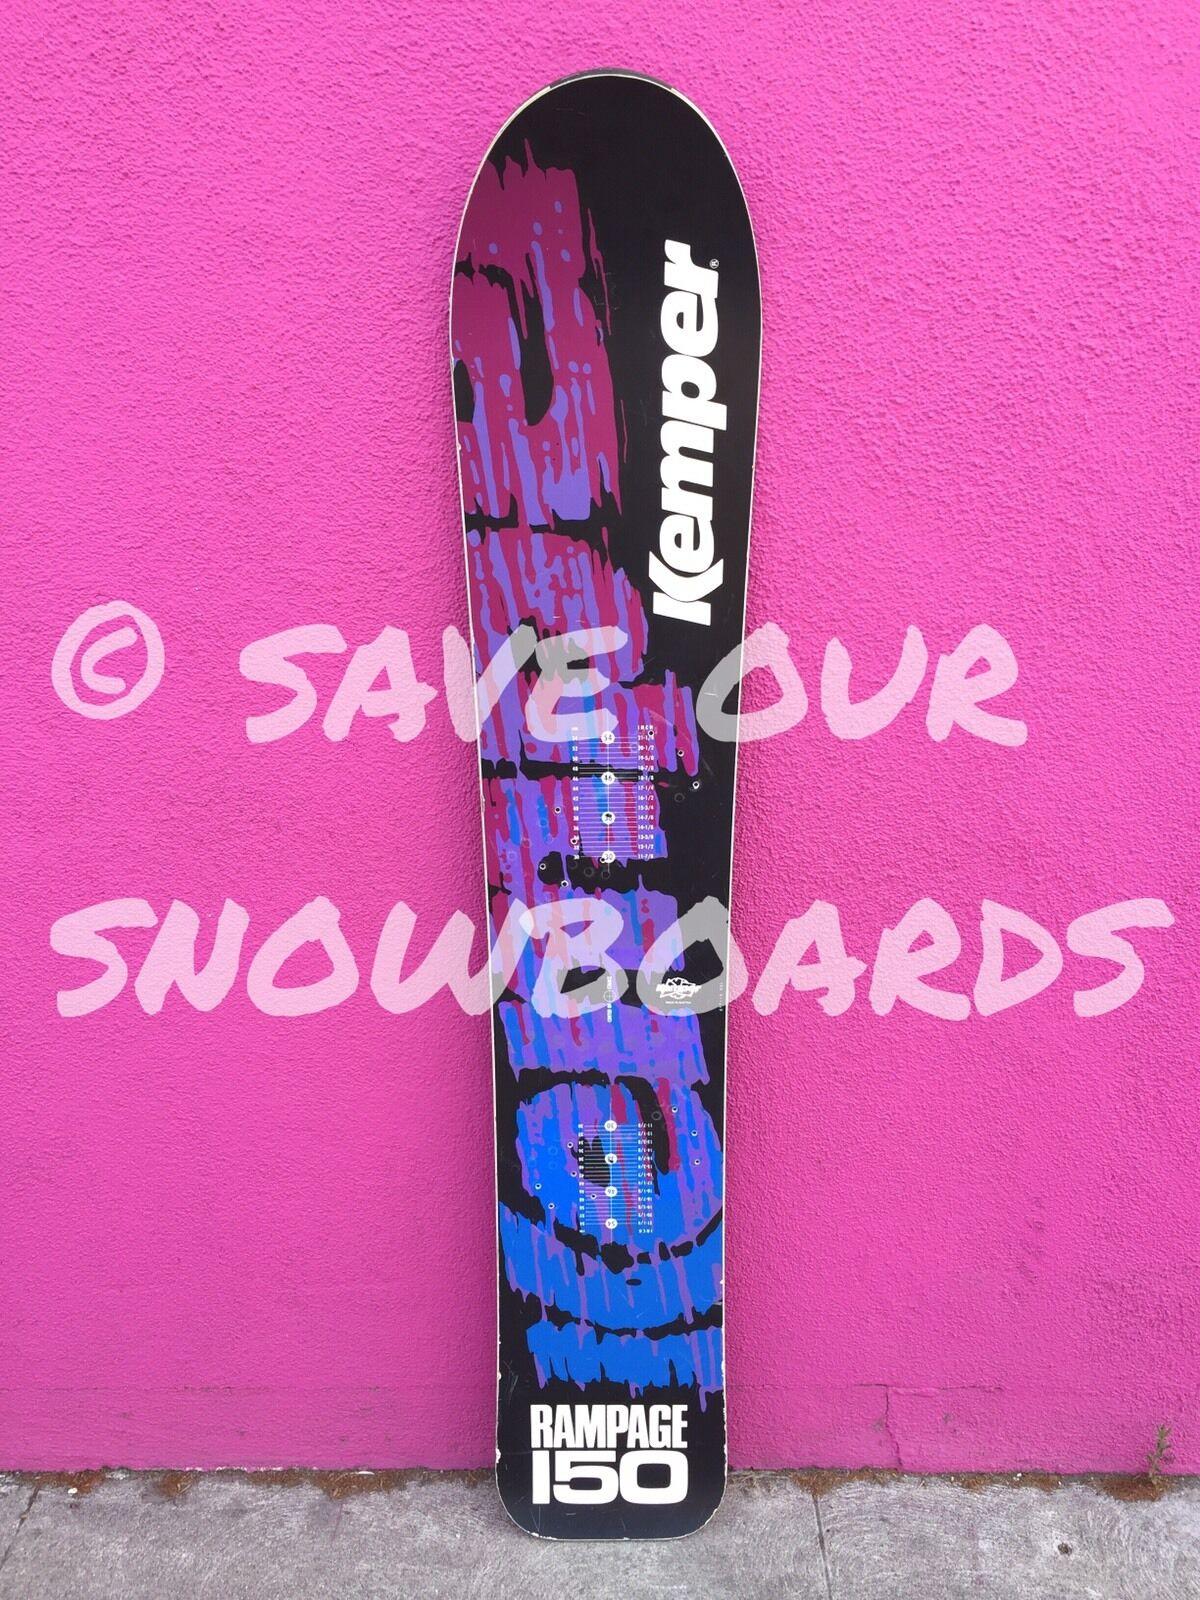 NICE  Vintage 1991 Kemper Rampage  150 Snowboard Austria bluee purple  just buy it